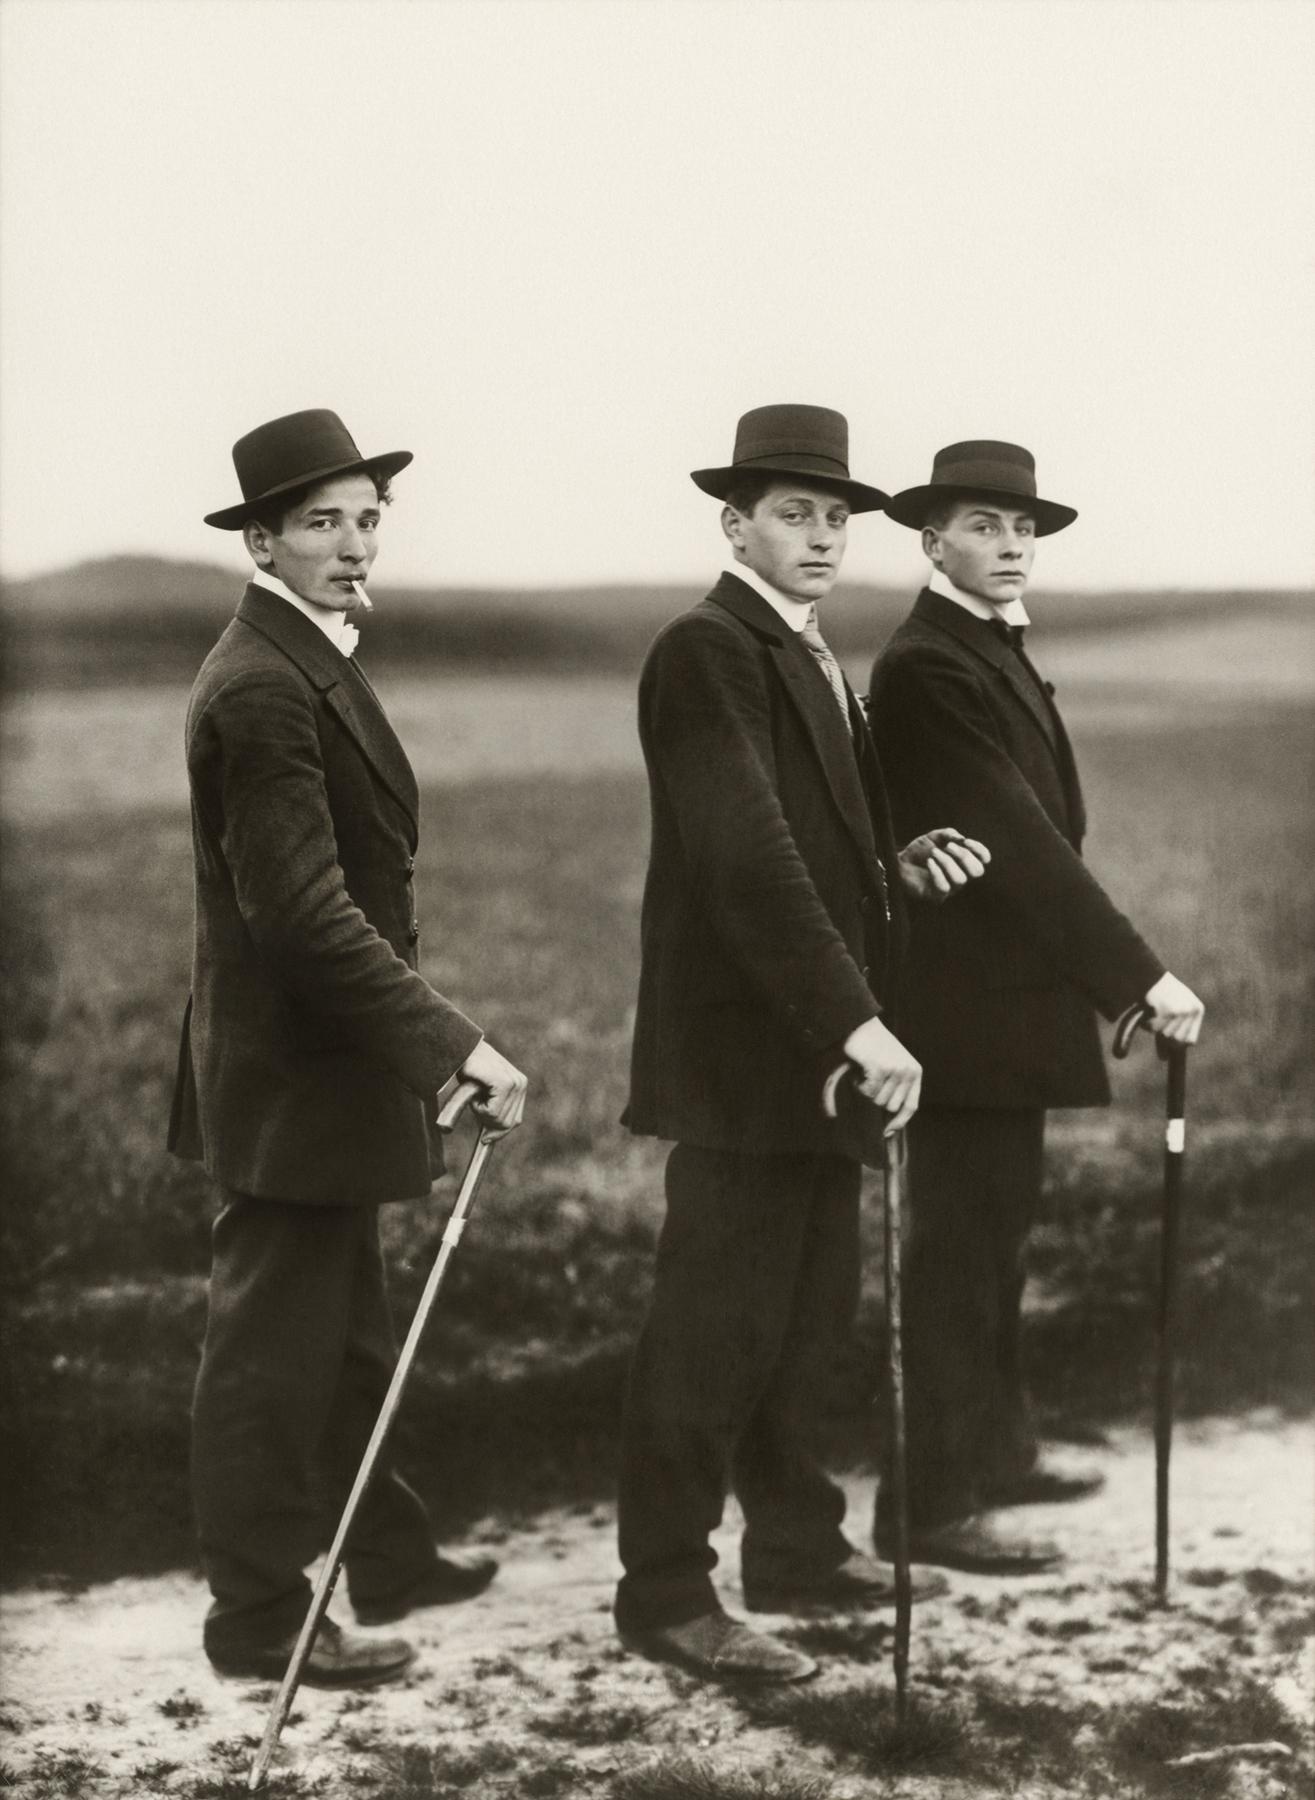 Fotó: Young farmers, 1914 © August Sander